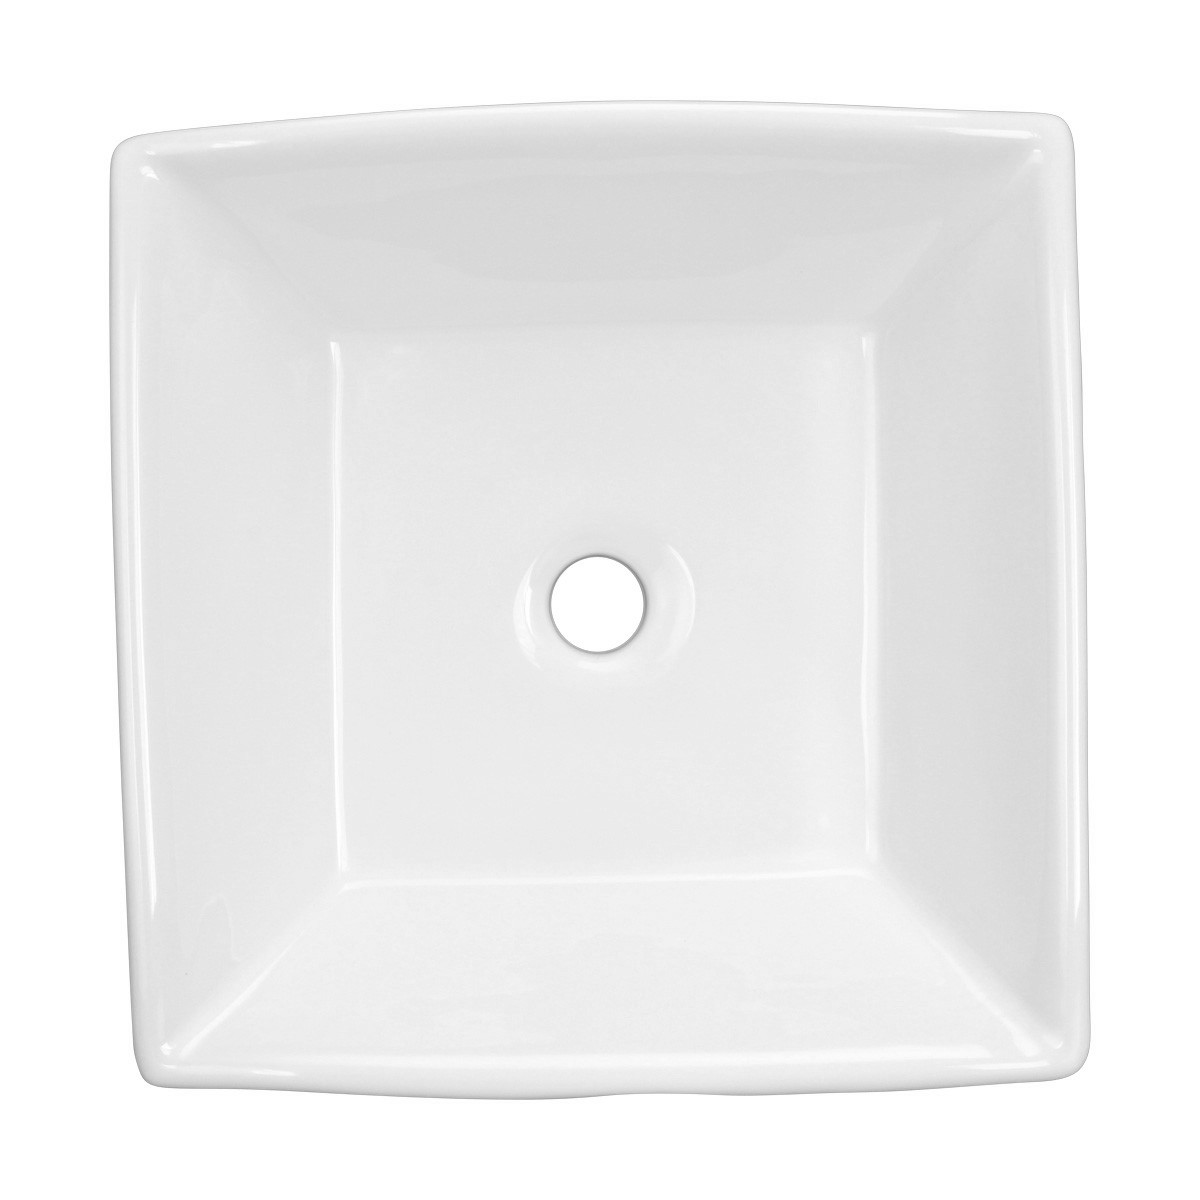 Bathroom Vessel Sink Above Counter White Porcelain Square Gloss Finish Art Basin bathroom vessel sinks Countertop vessel sink Bathroom Modern Vanity Sink Top